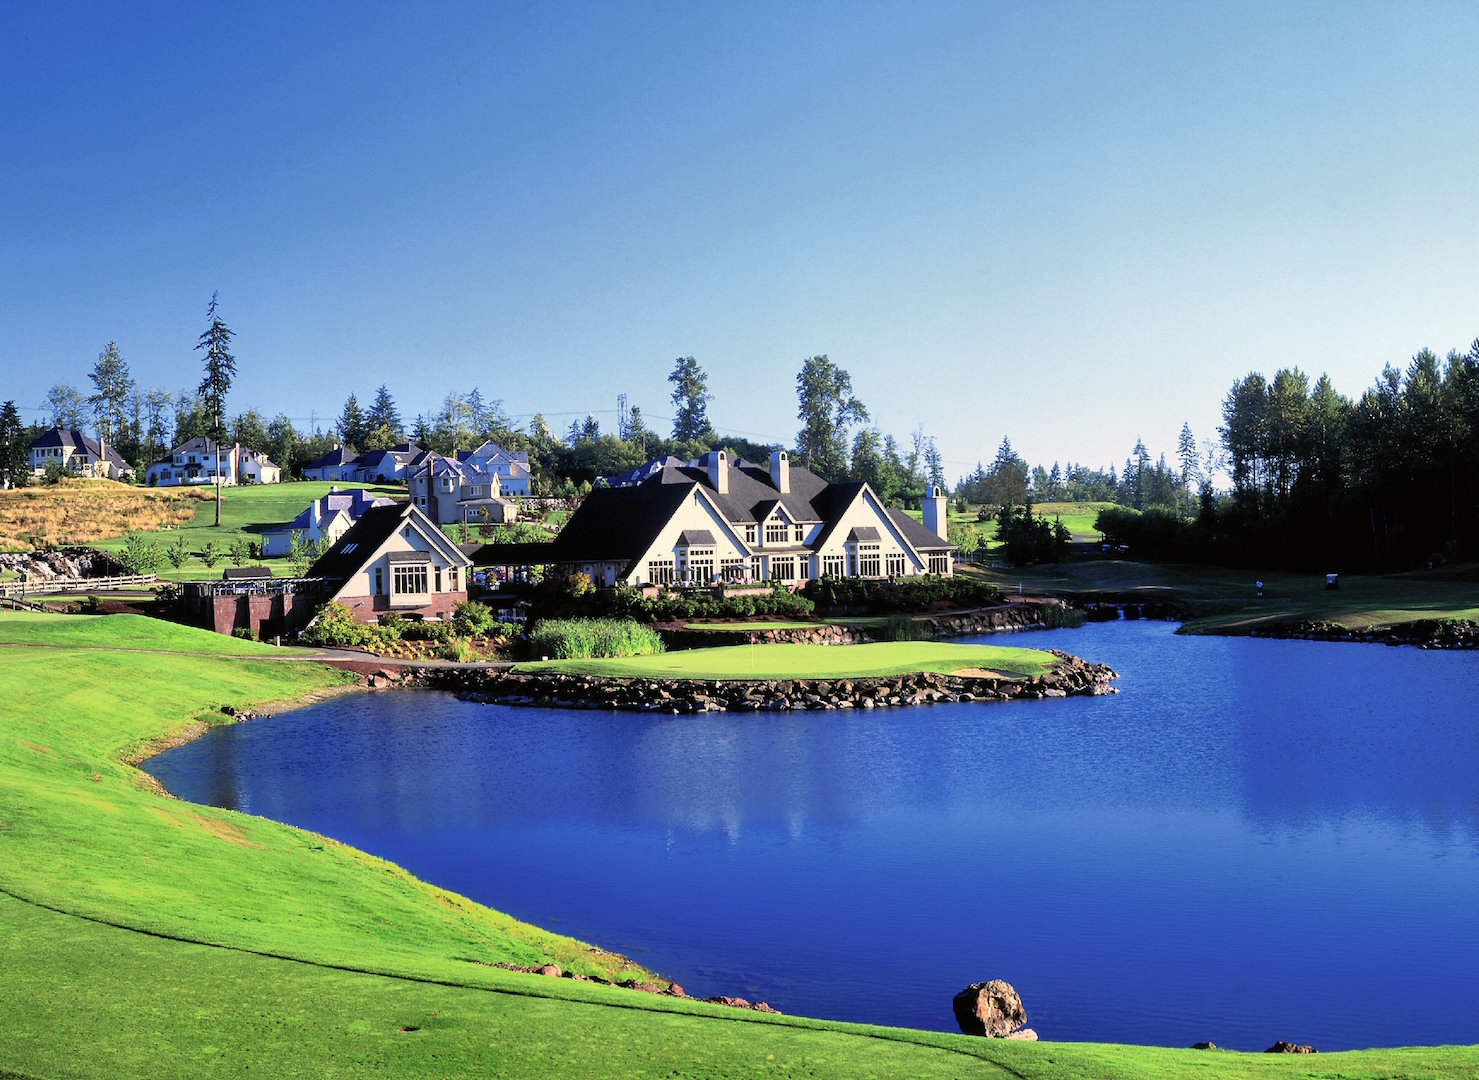 Oki Golf Sells Up For 137 000 000 00 Golfpunkhq